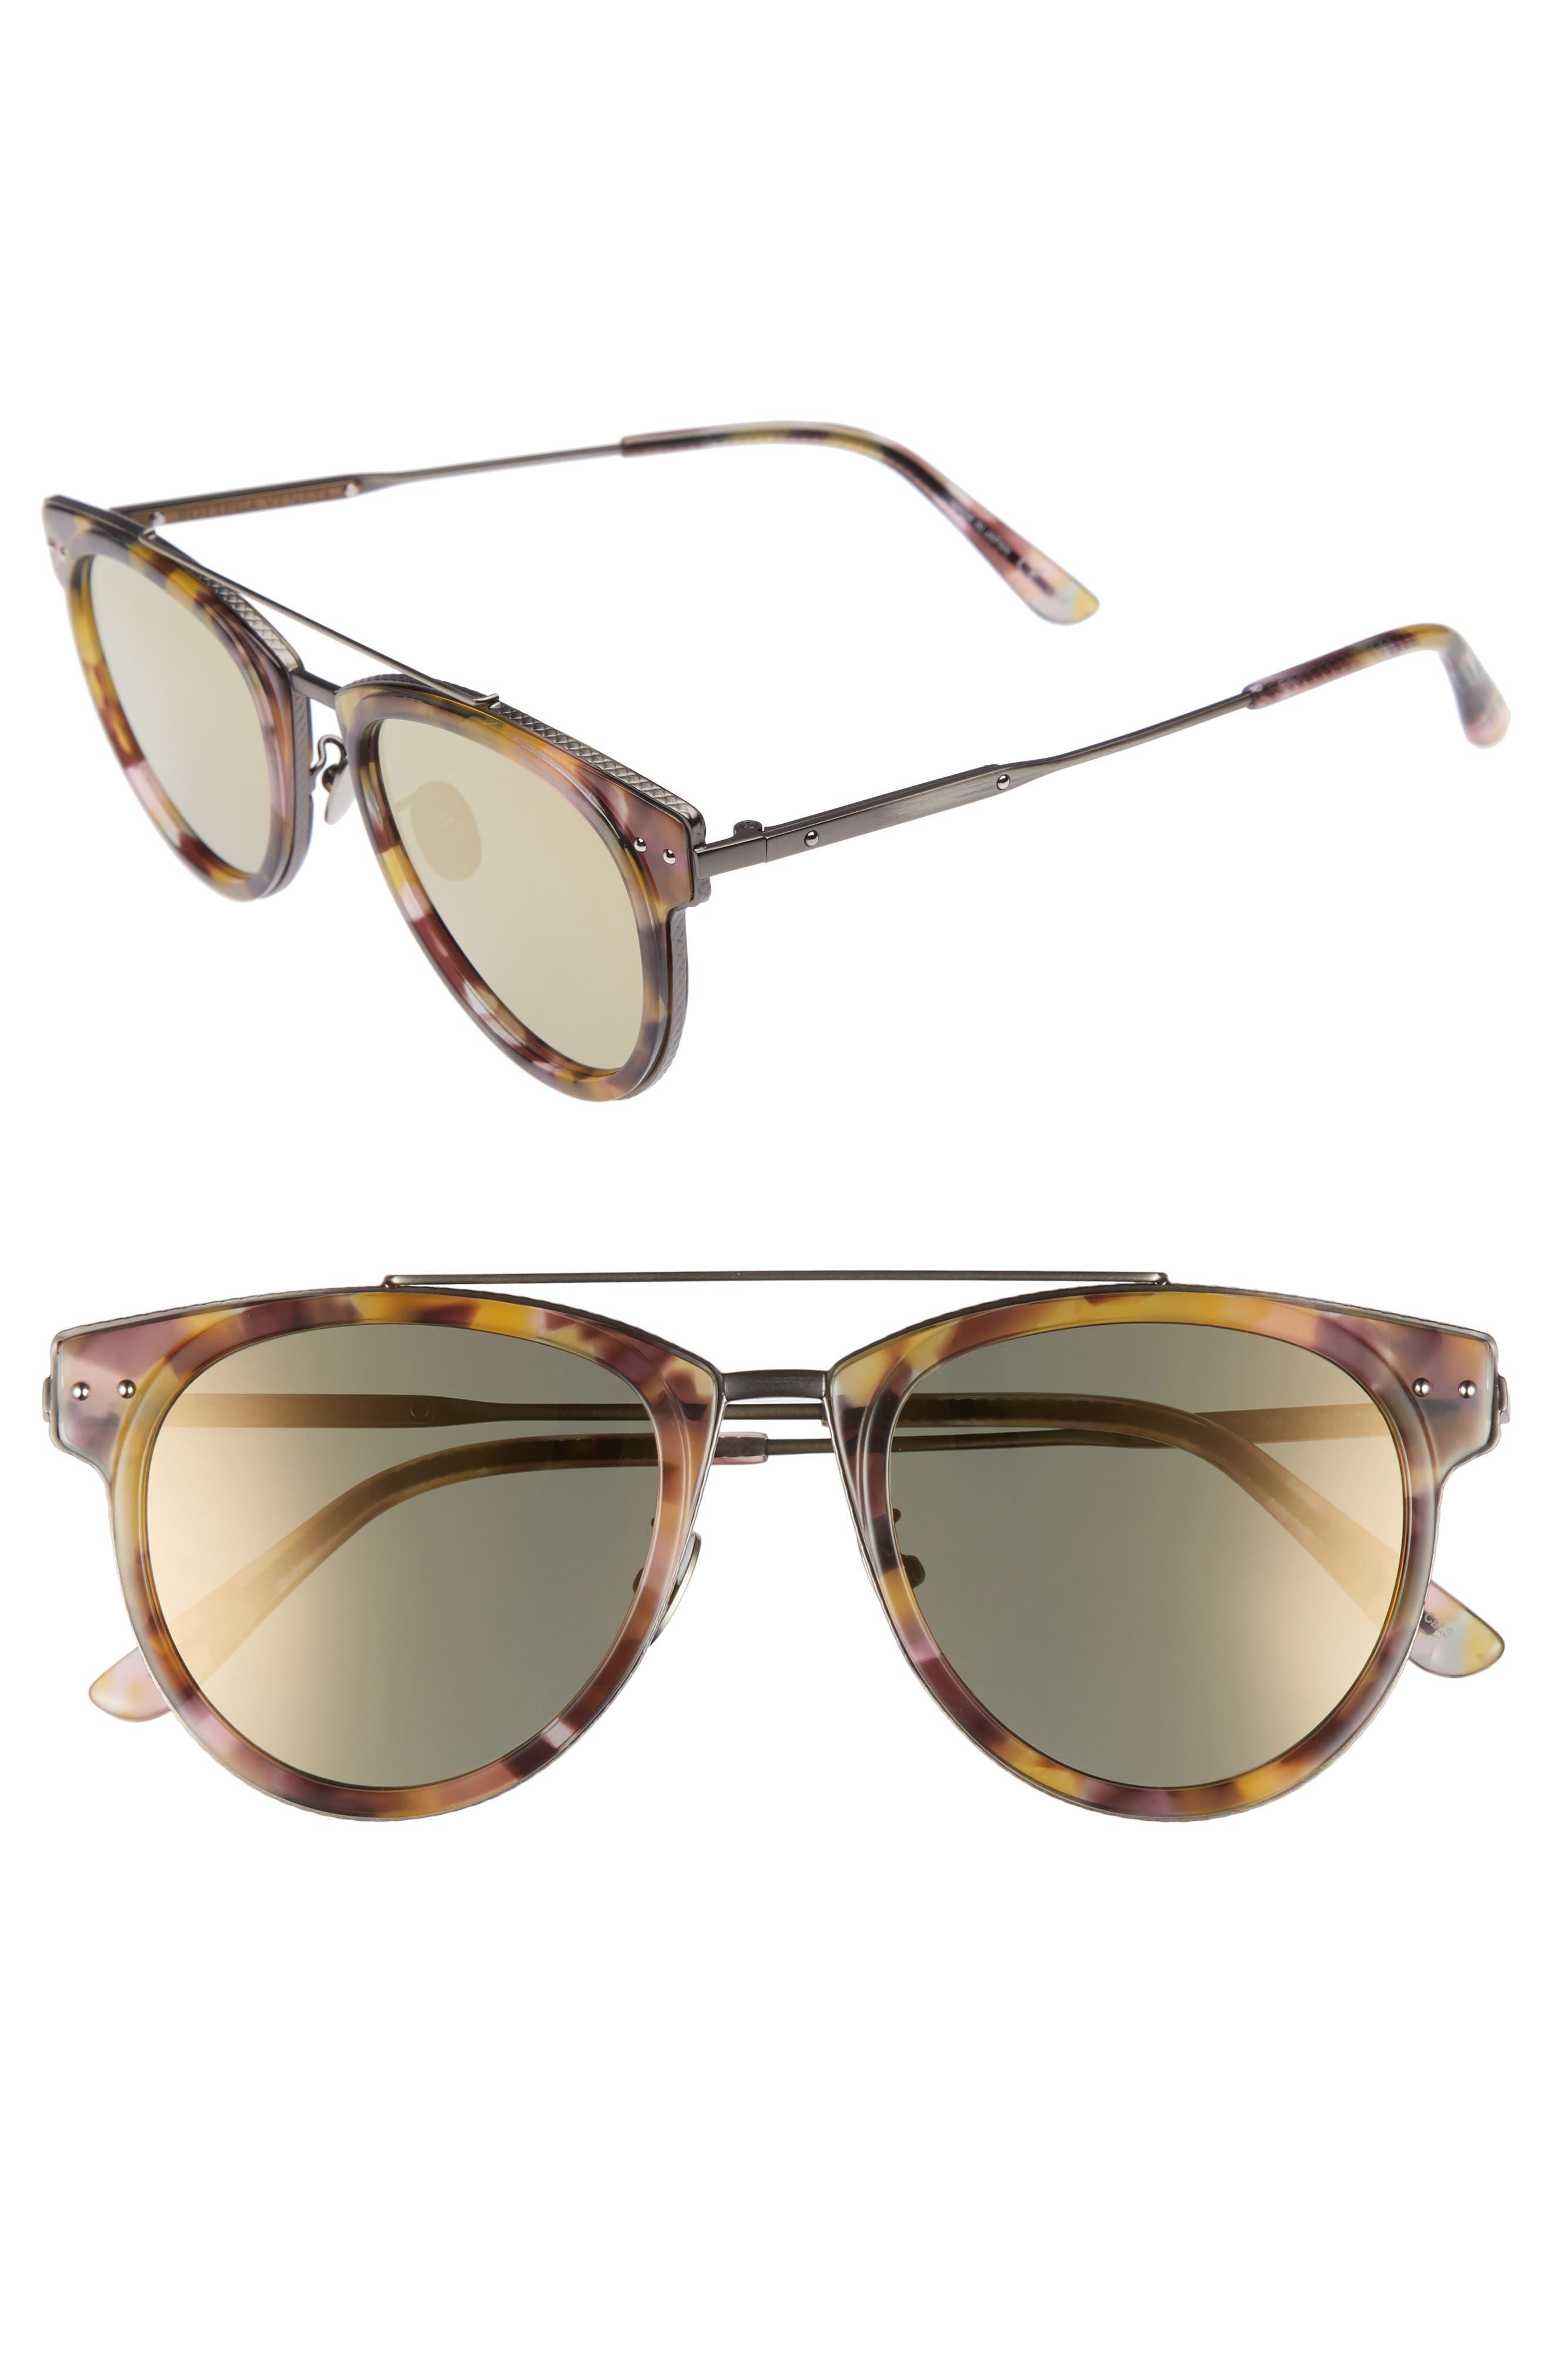 50mm Sunglasses,                             Main thumbnail 1, color,                             AVANA BROWN